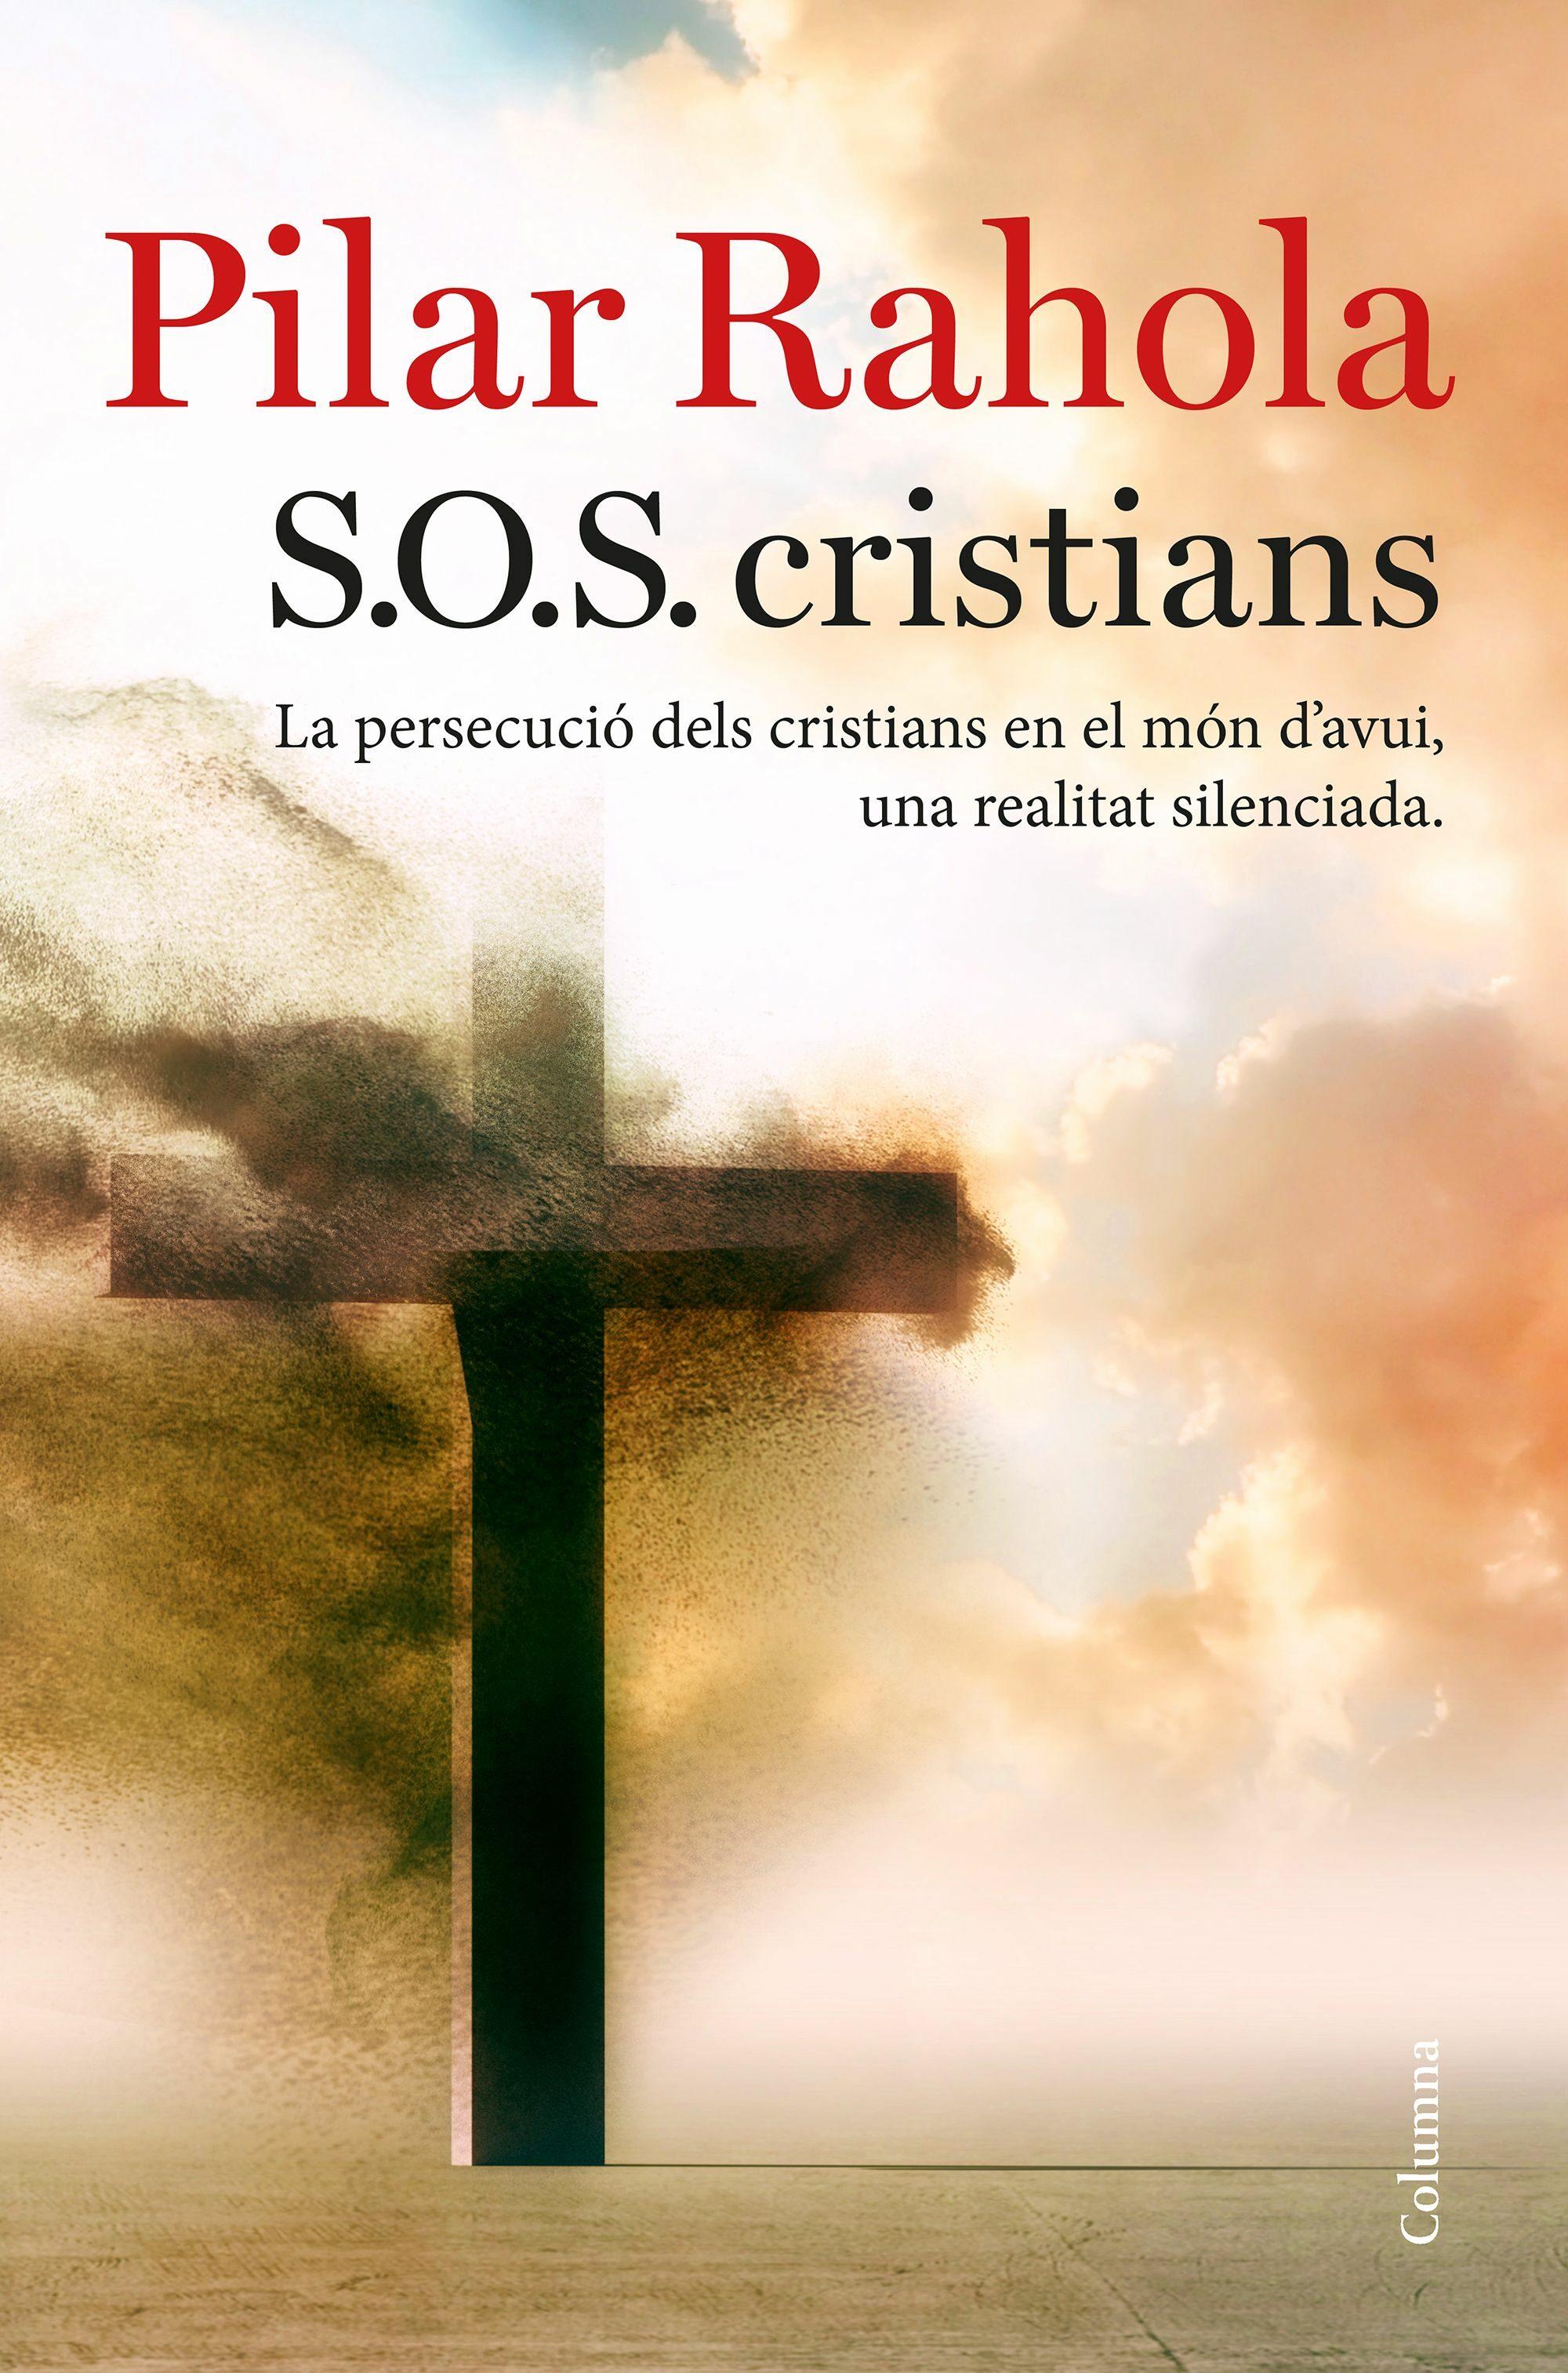 s.o.s. cristians-pilar rahola-9788466423625